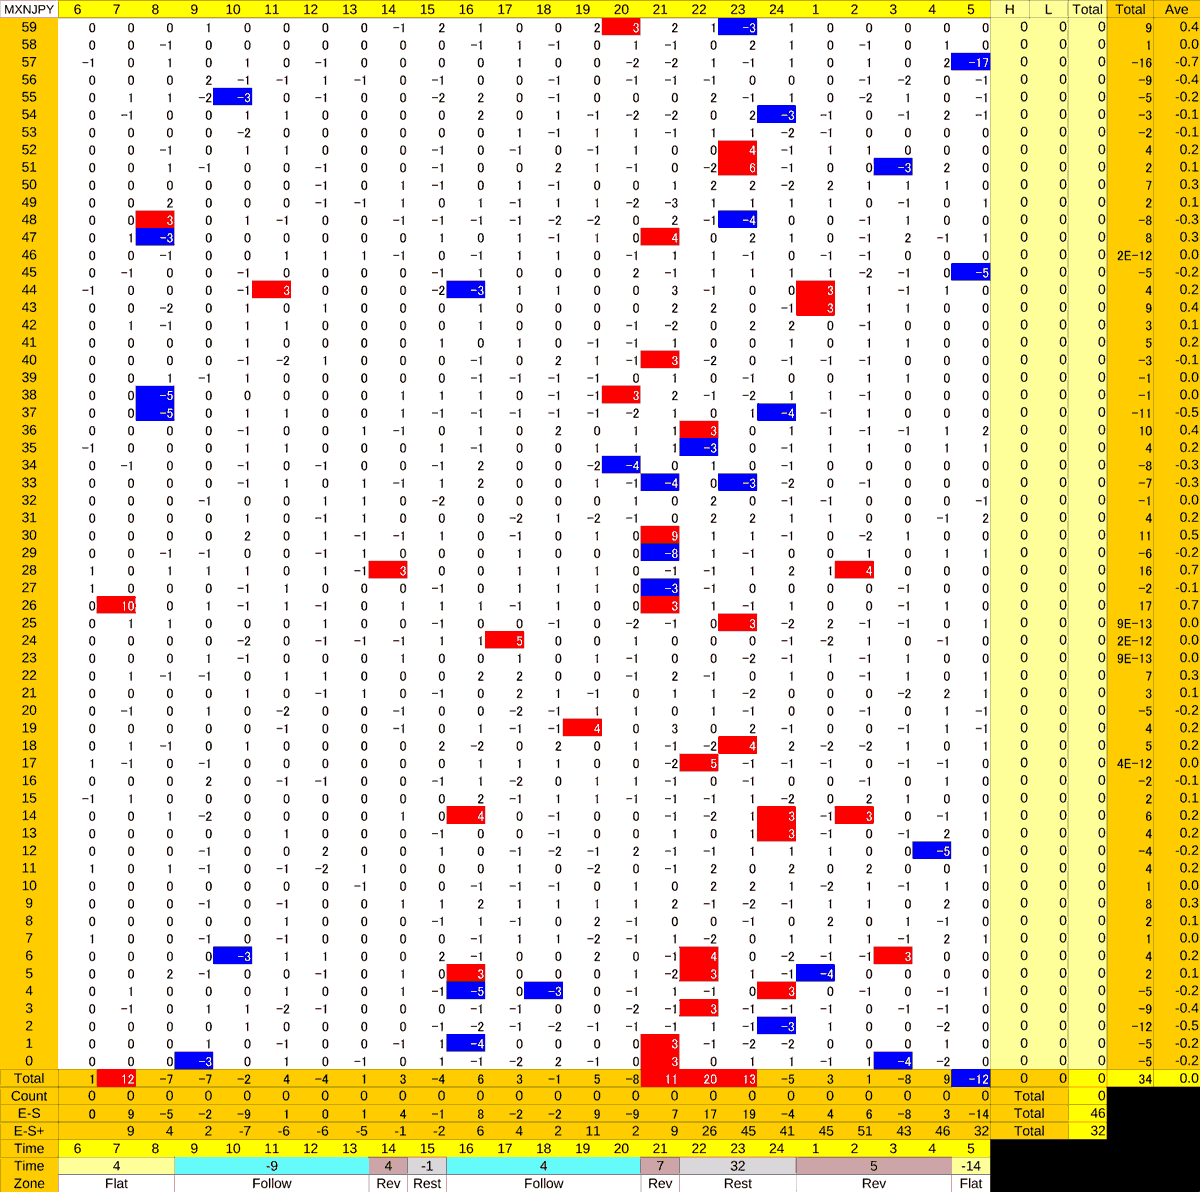 20201022_HS(3)MXNJPY